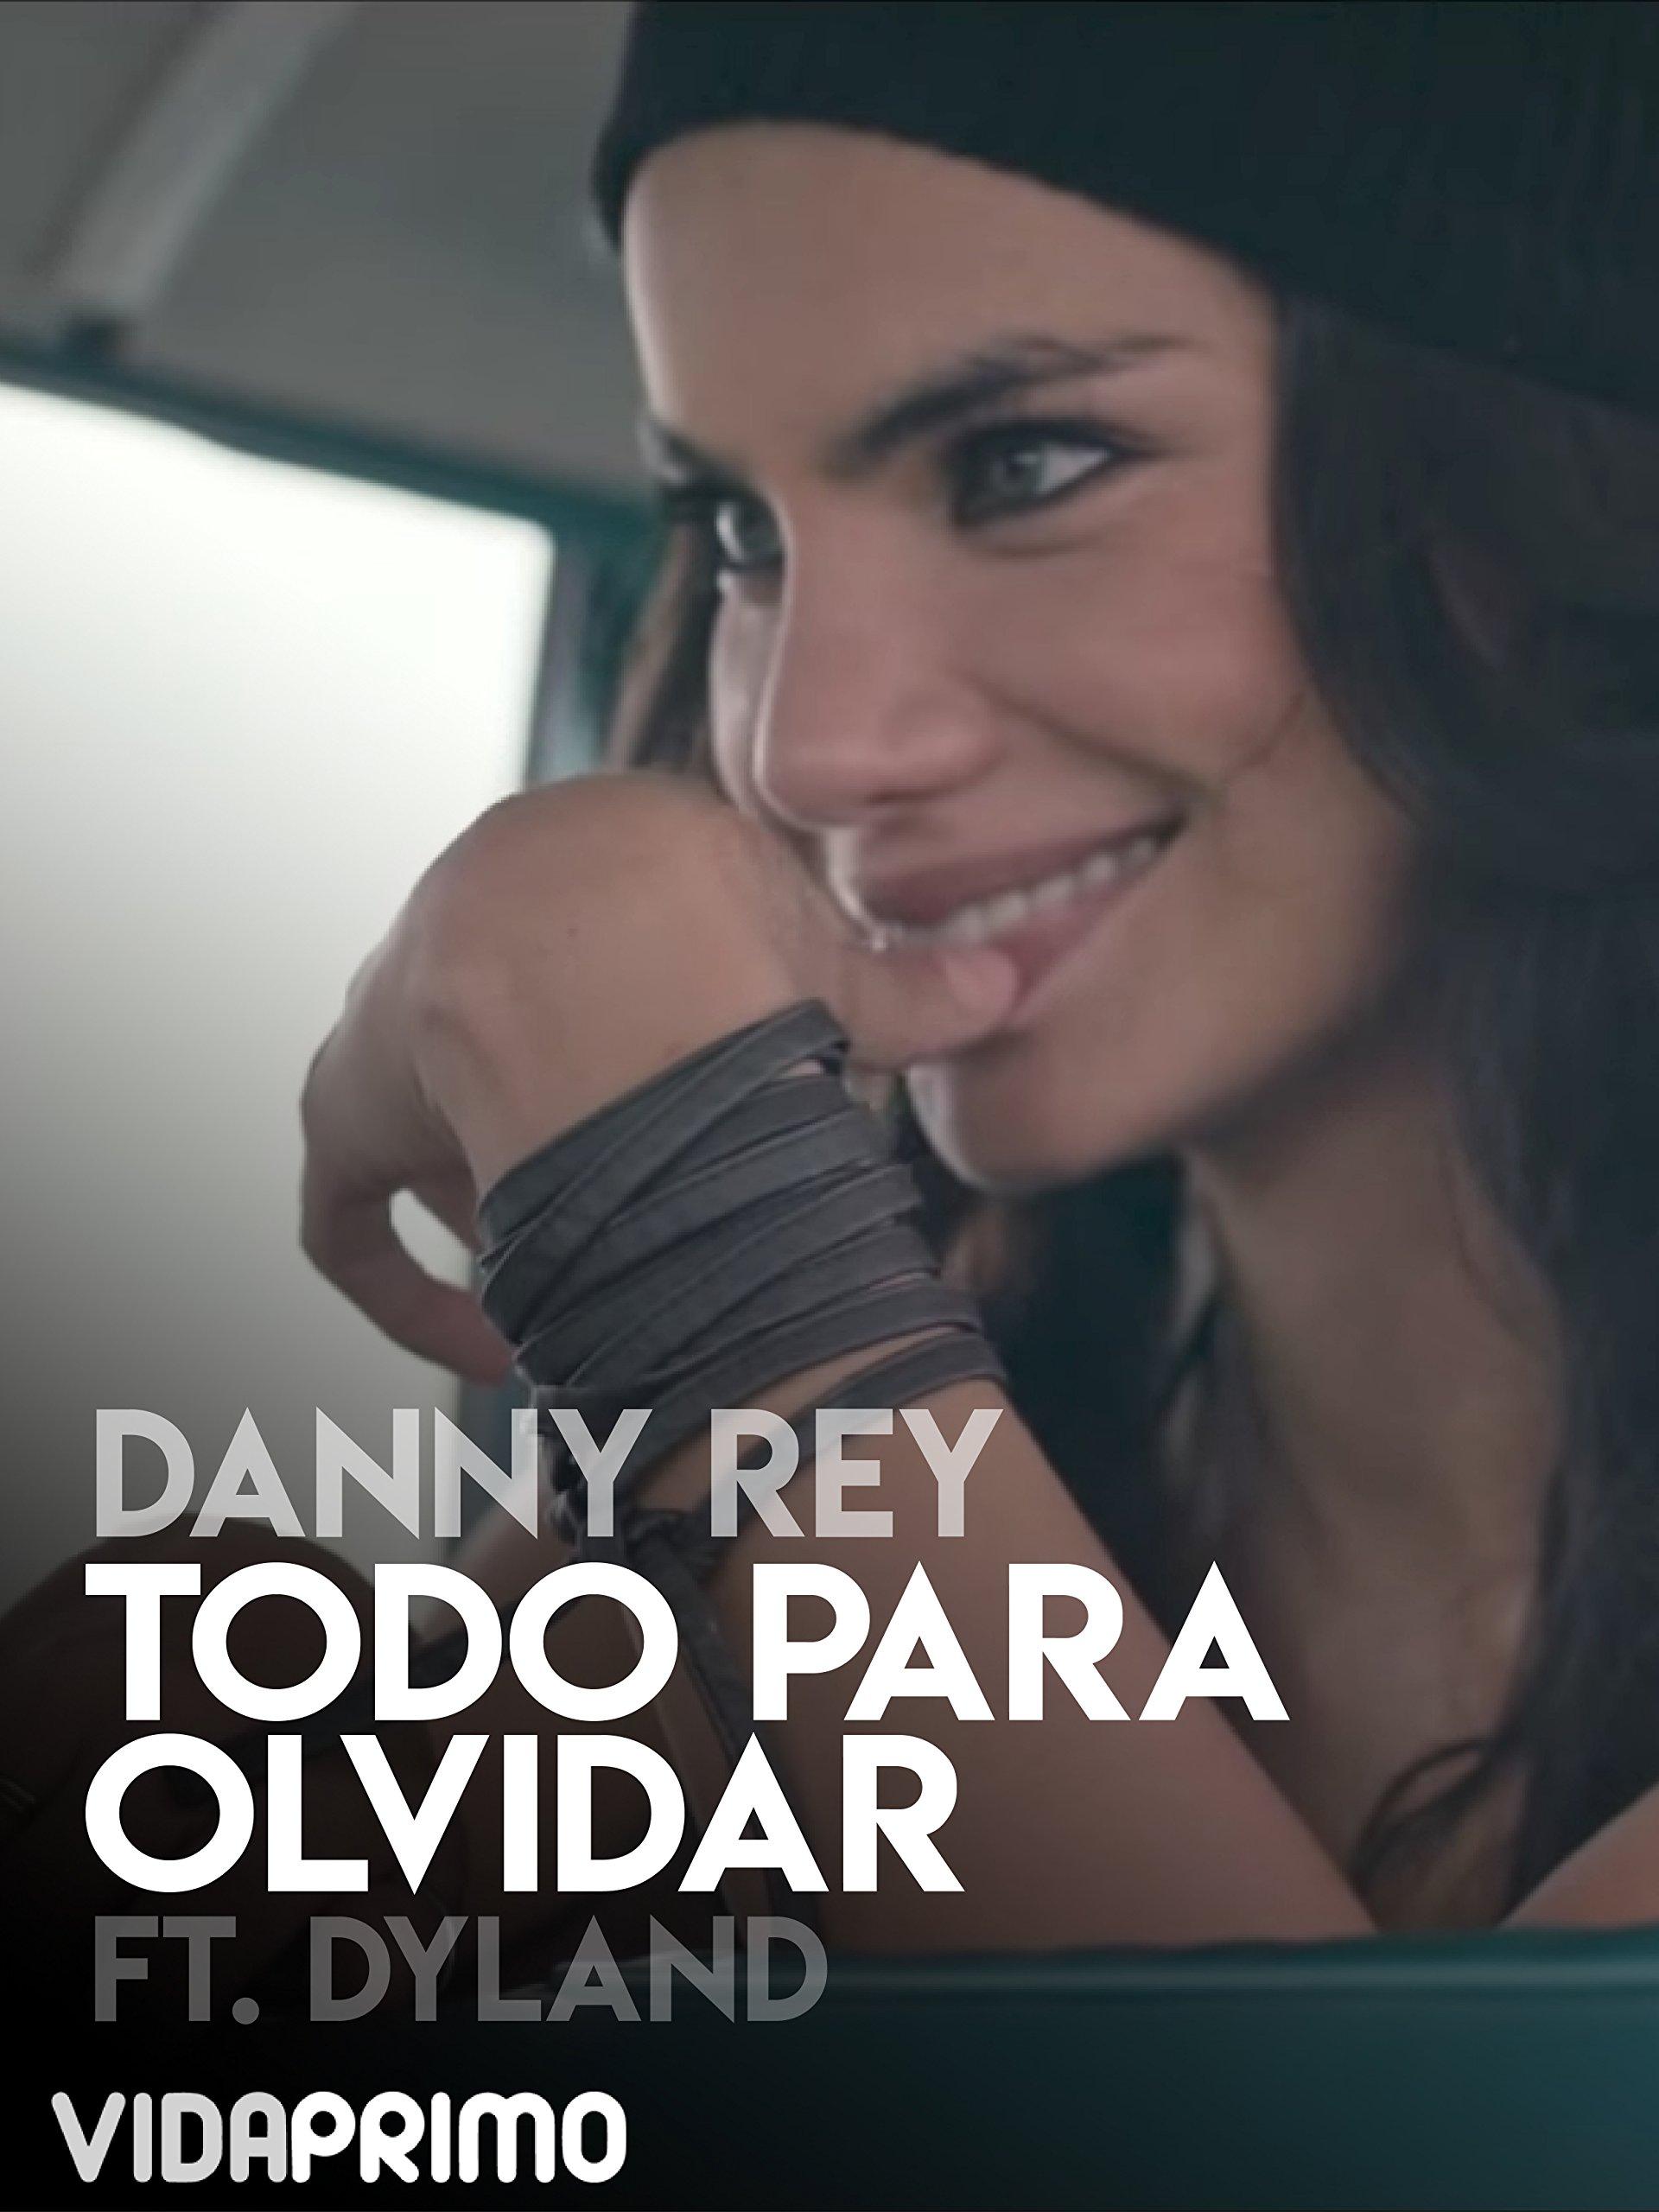 Danny Rey